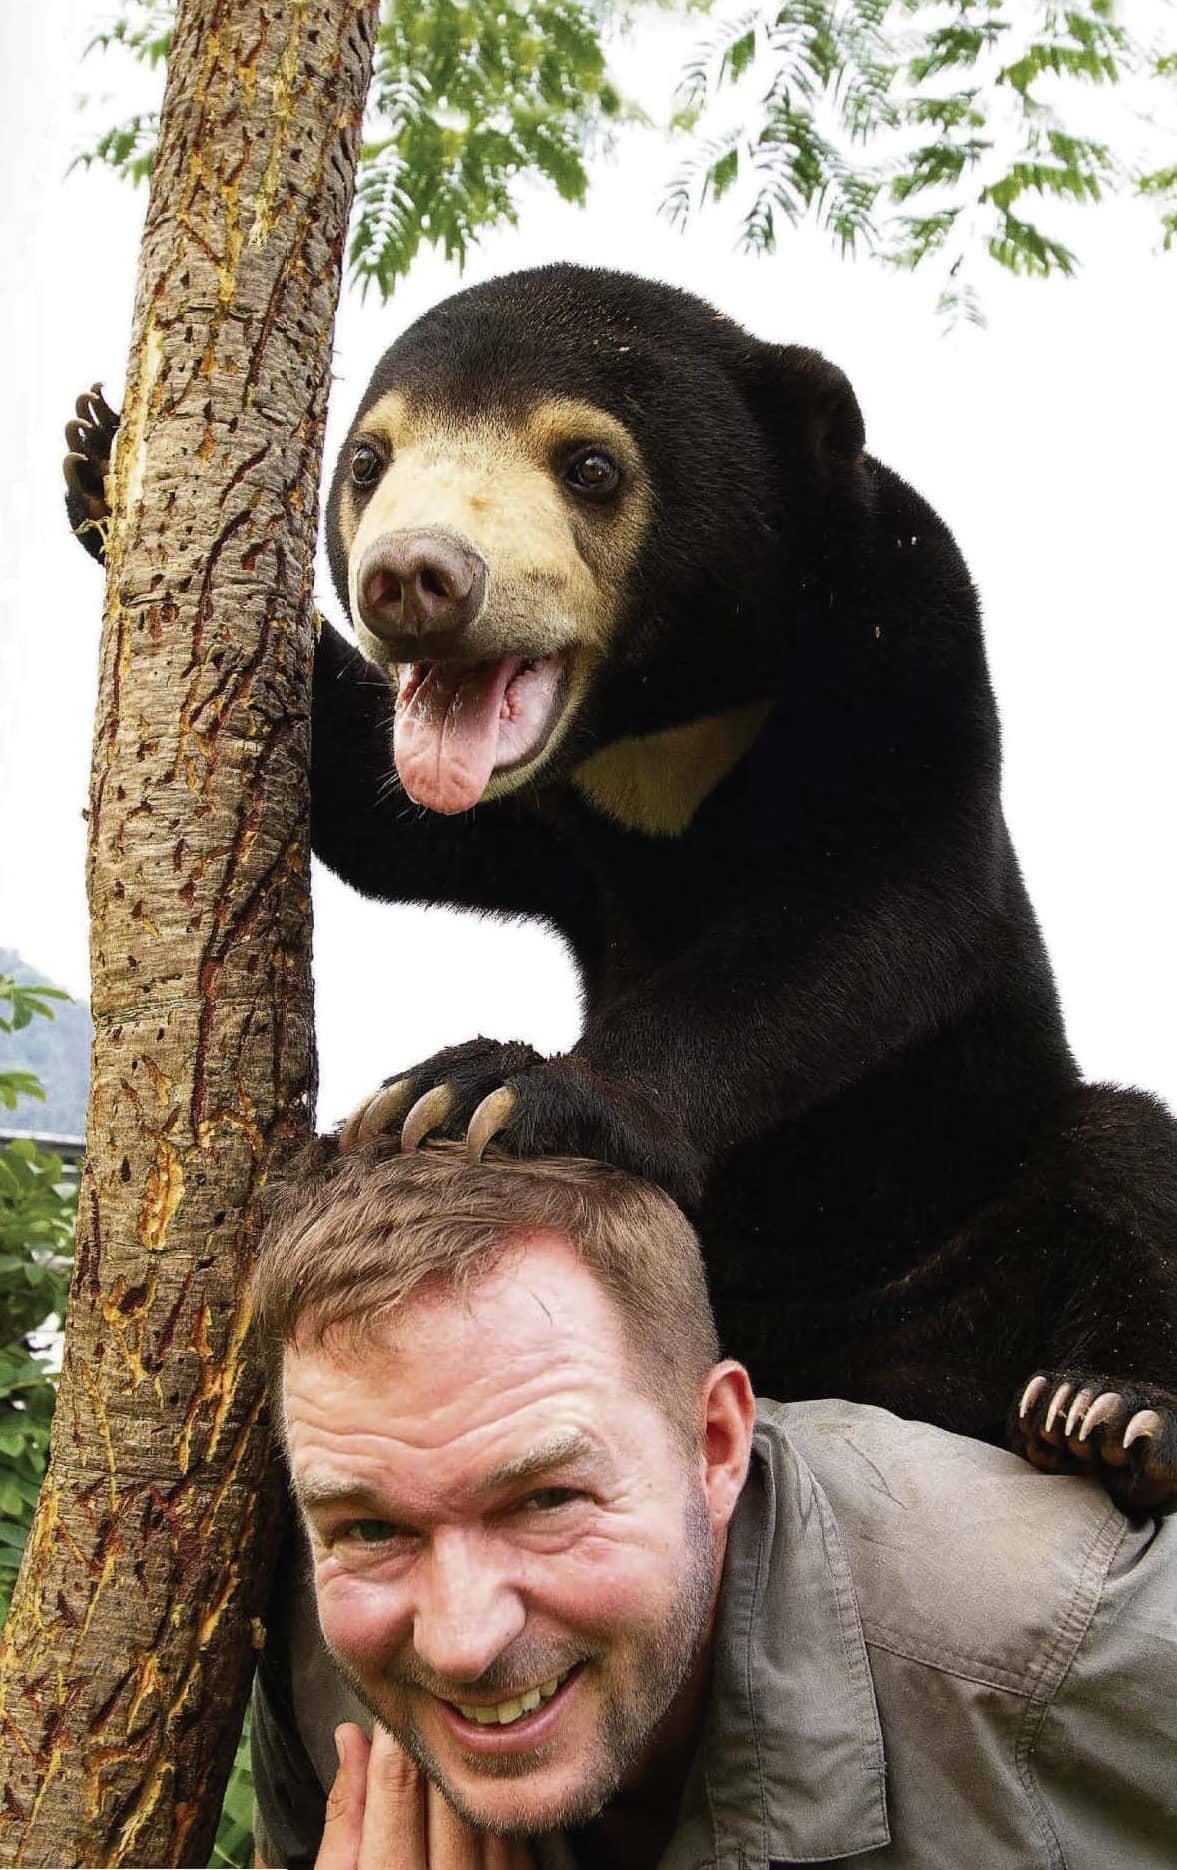 The bear care bunch